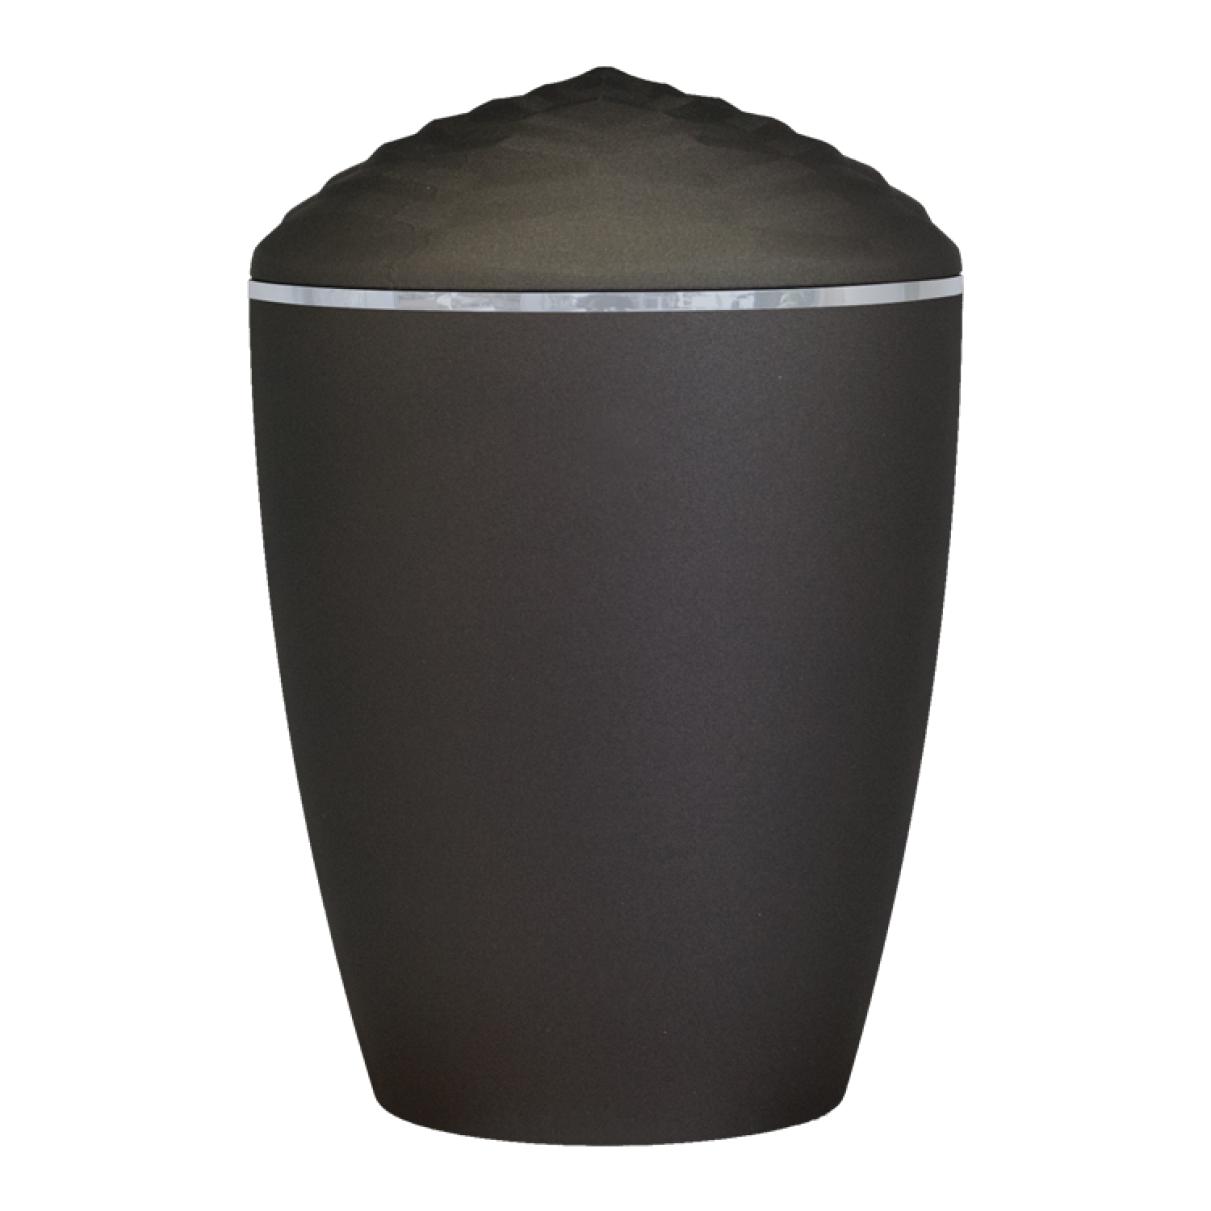 Forest Silver Band Bio Cremation Urn – Black